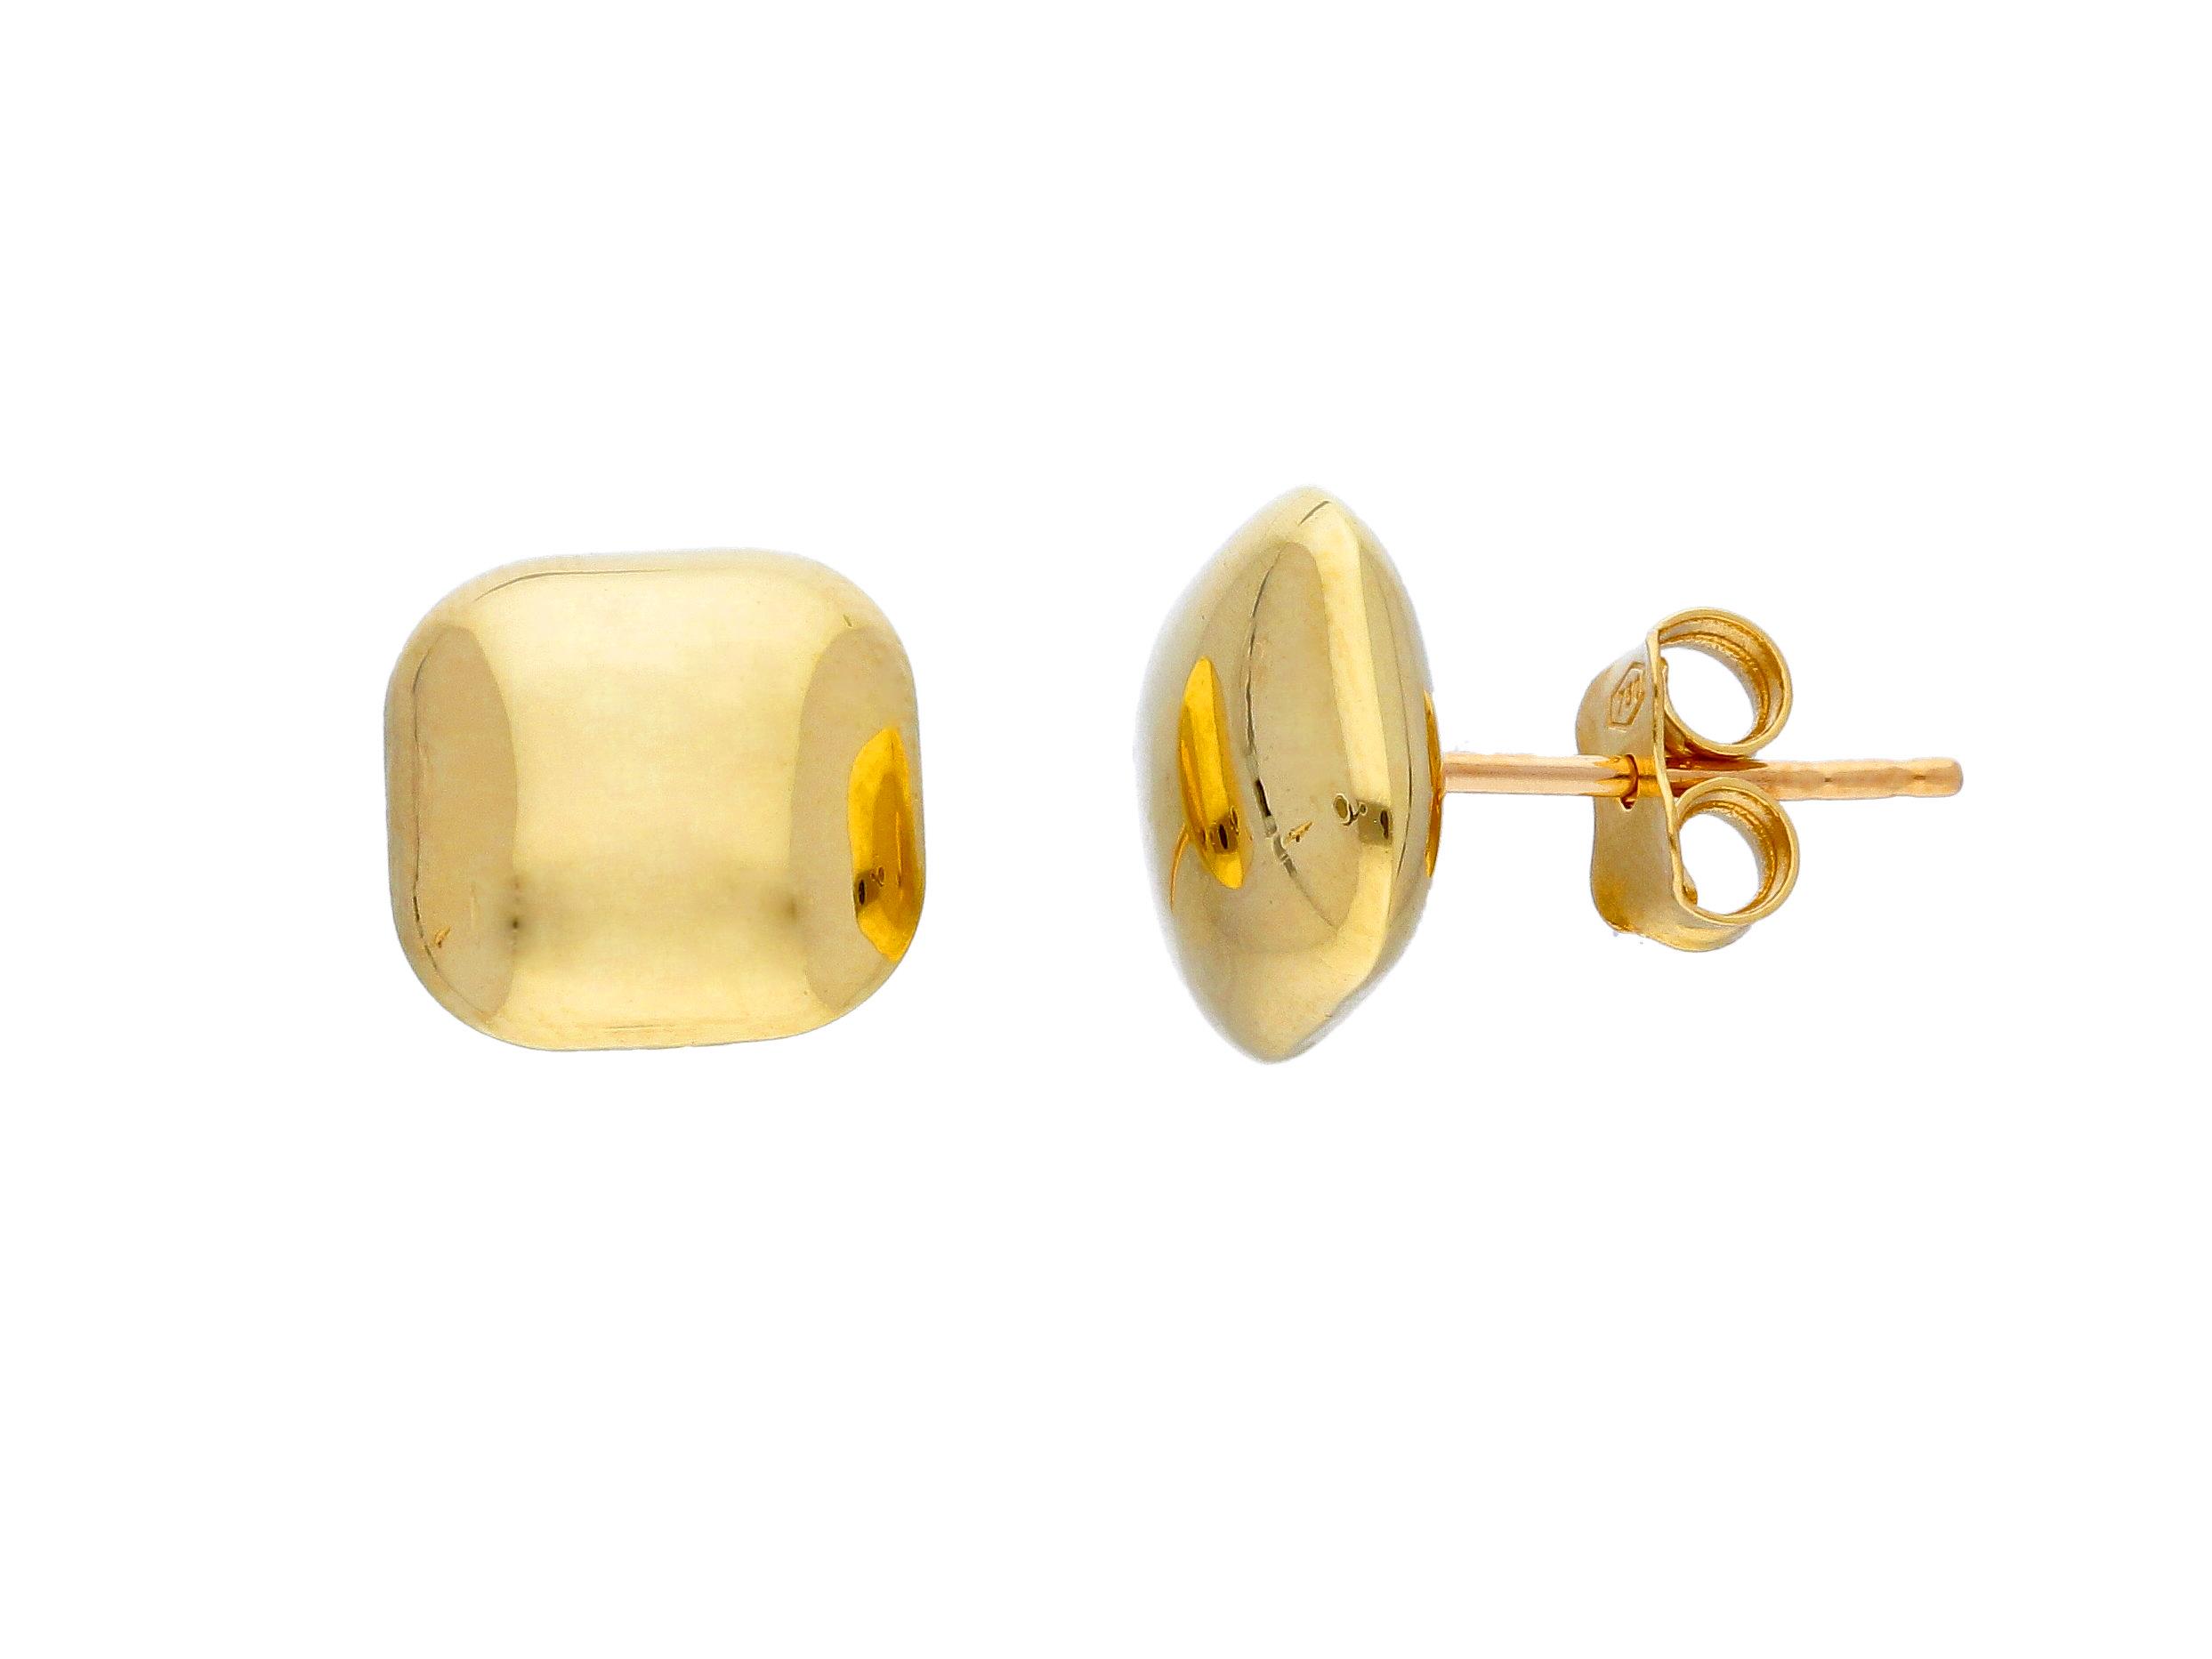 pendientes oro cuadrados - aretes mujer originales - gold earrings to buy online - joyeria marga mira